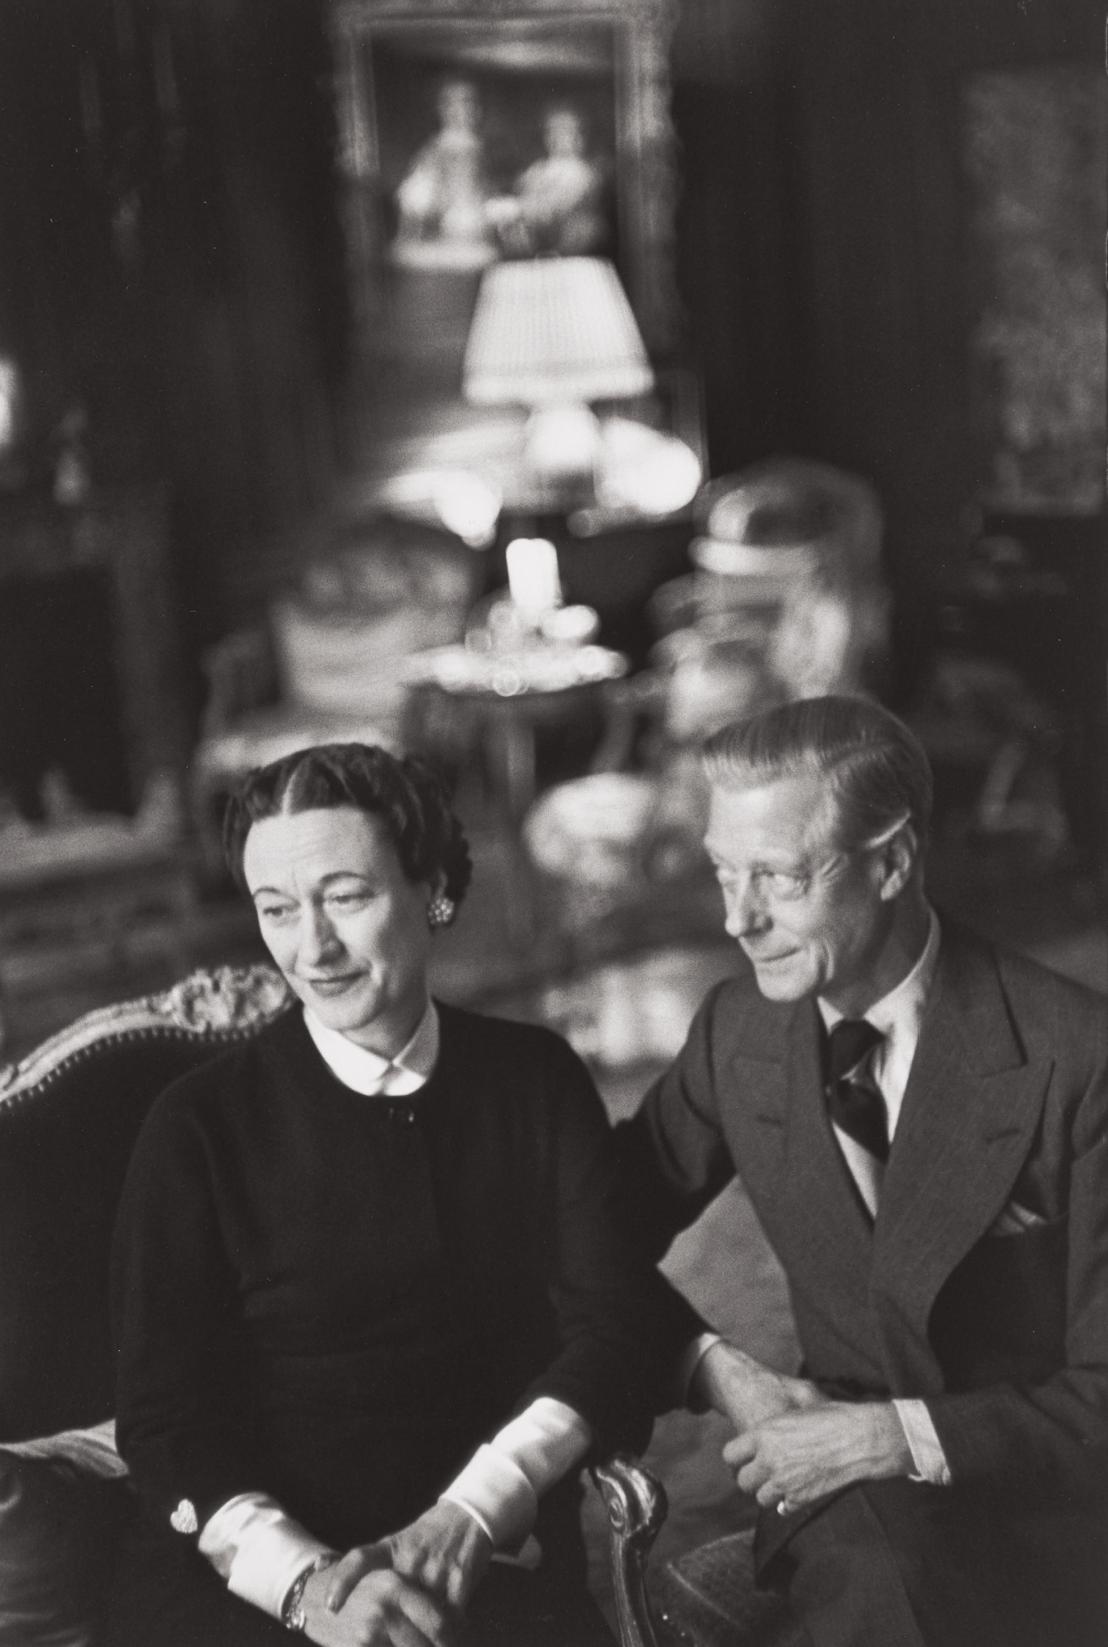 Henri Cartier-Bresson-The Duke And Duchess Of Windsor, Paris-1951